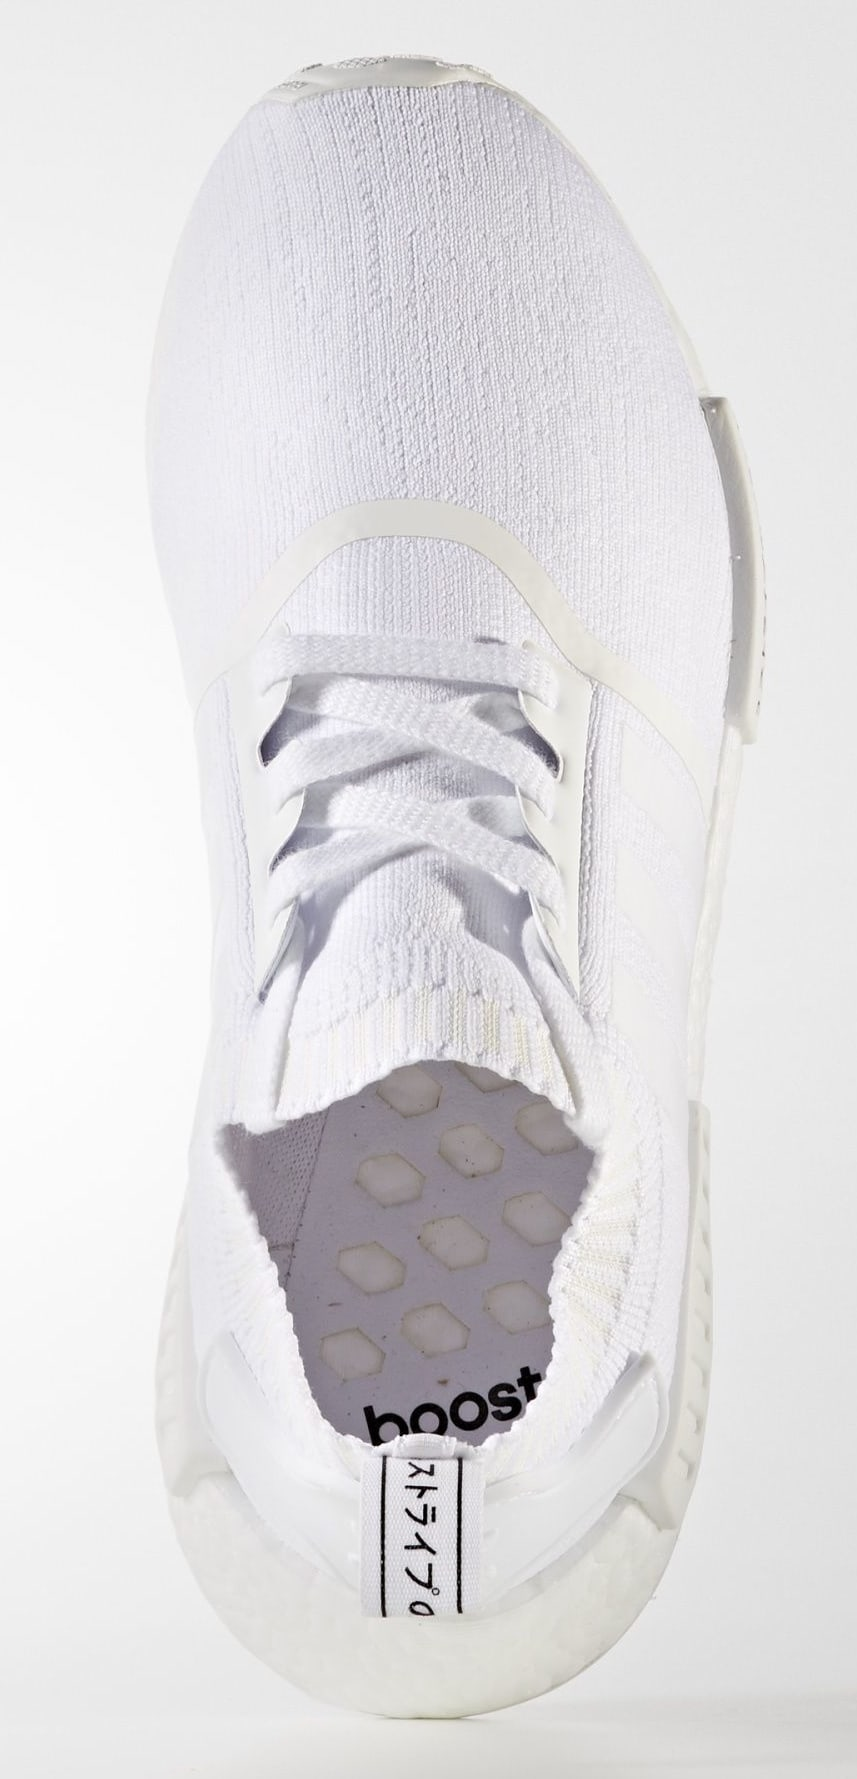 Cheap Adidas Originals NMD Primeknit VS Ultraboost #Pickone Battle With Dj